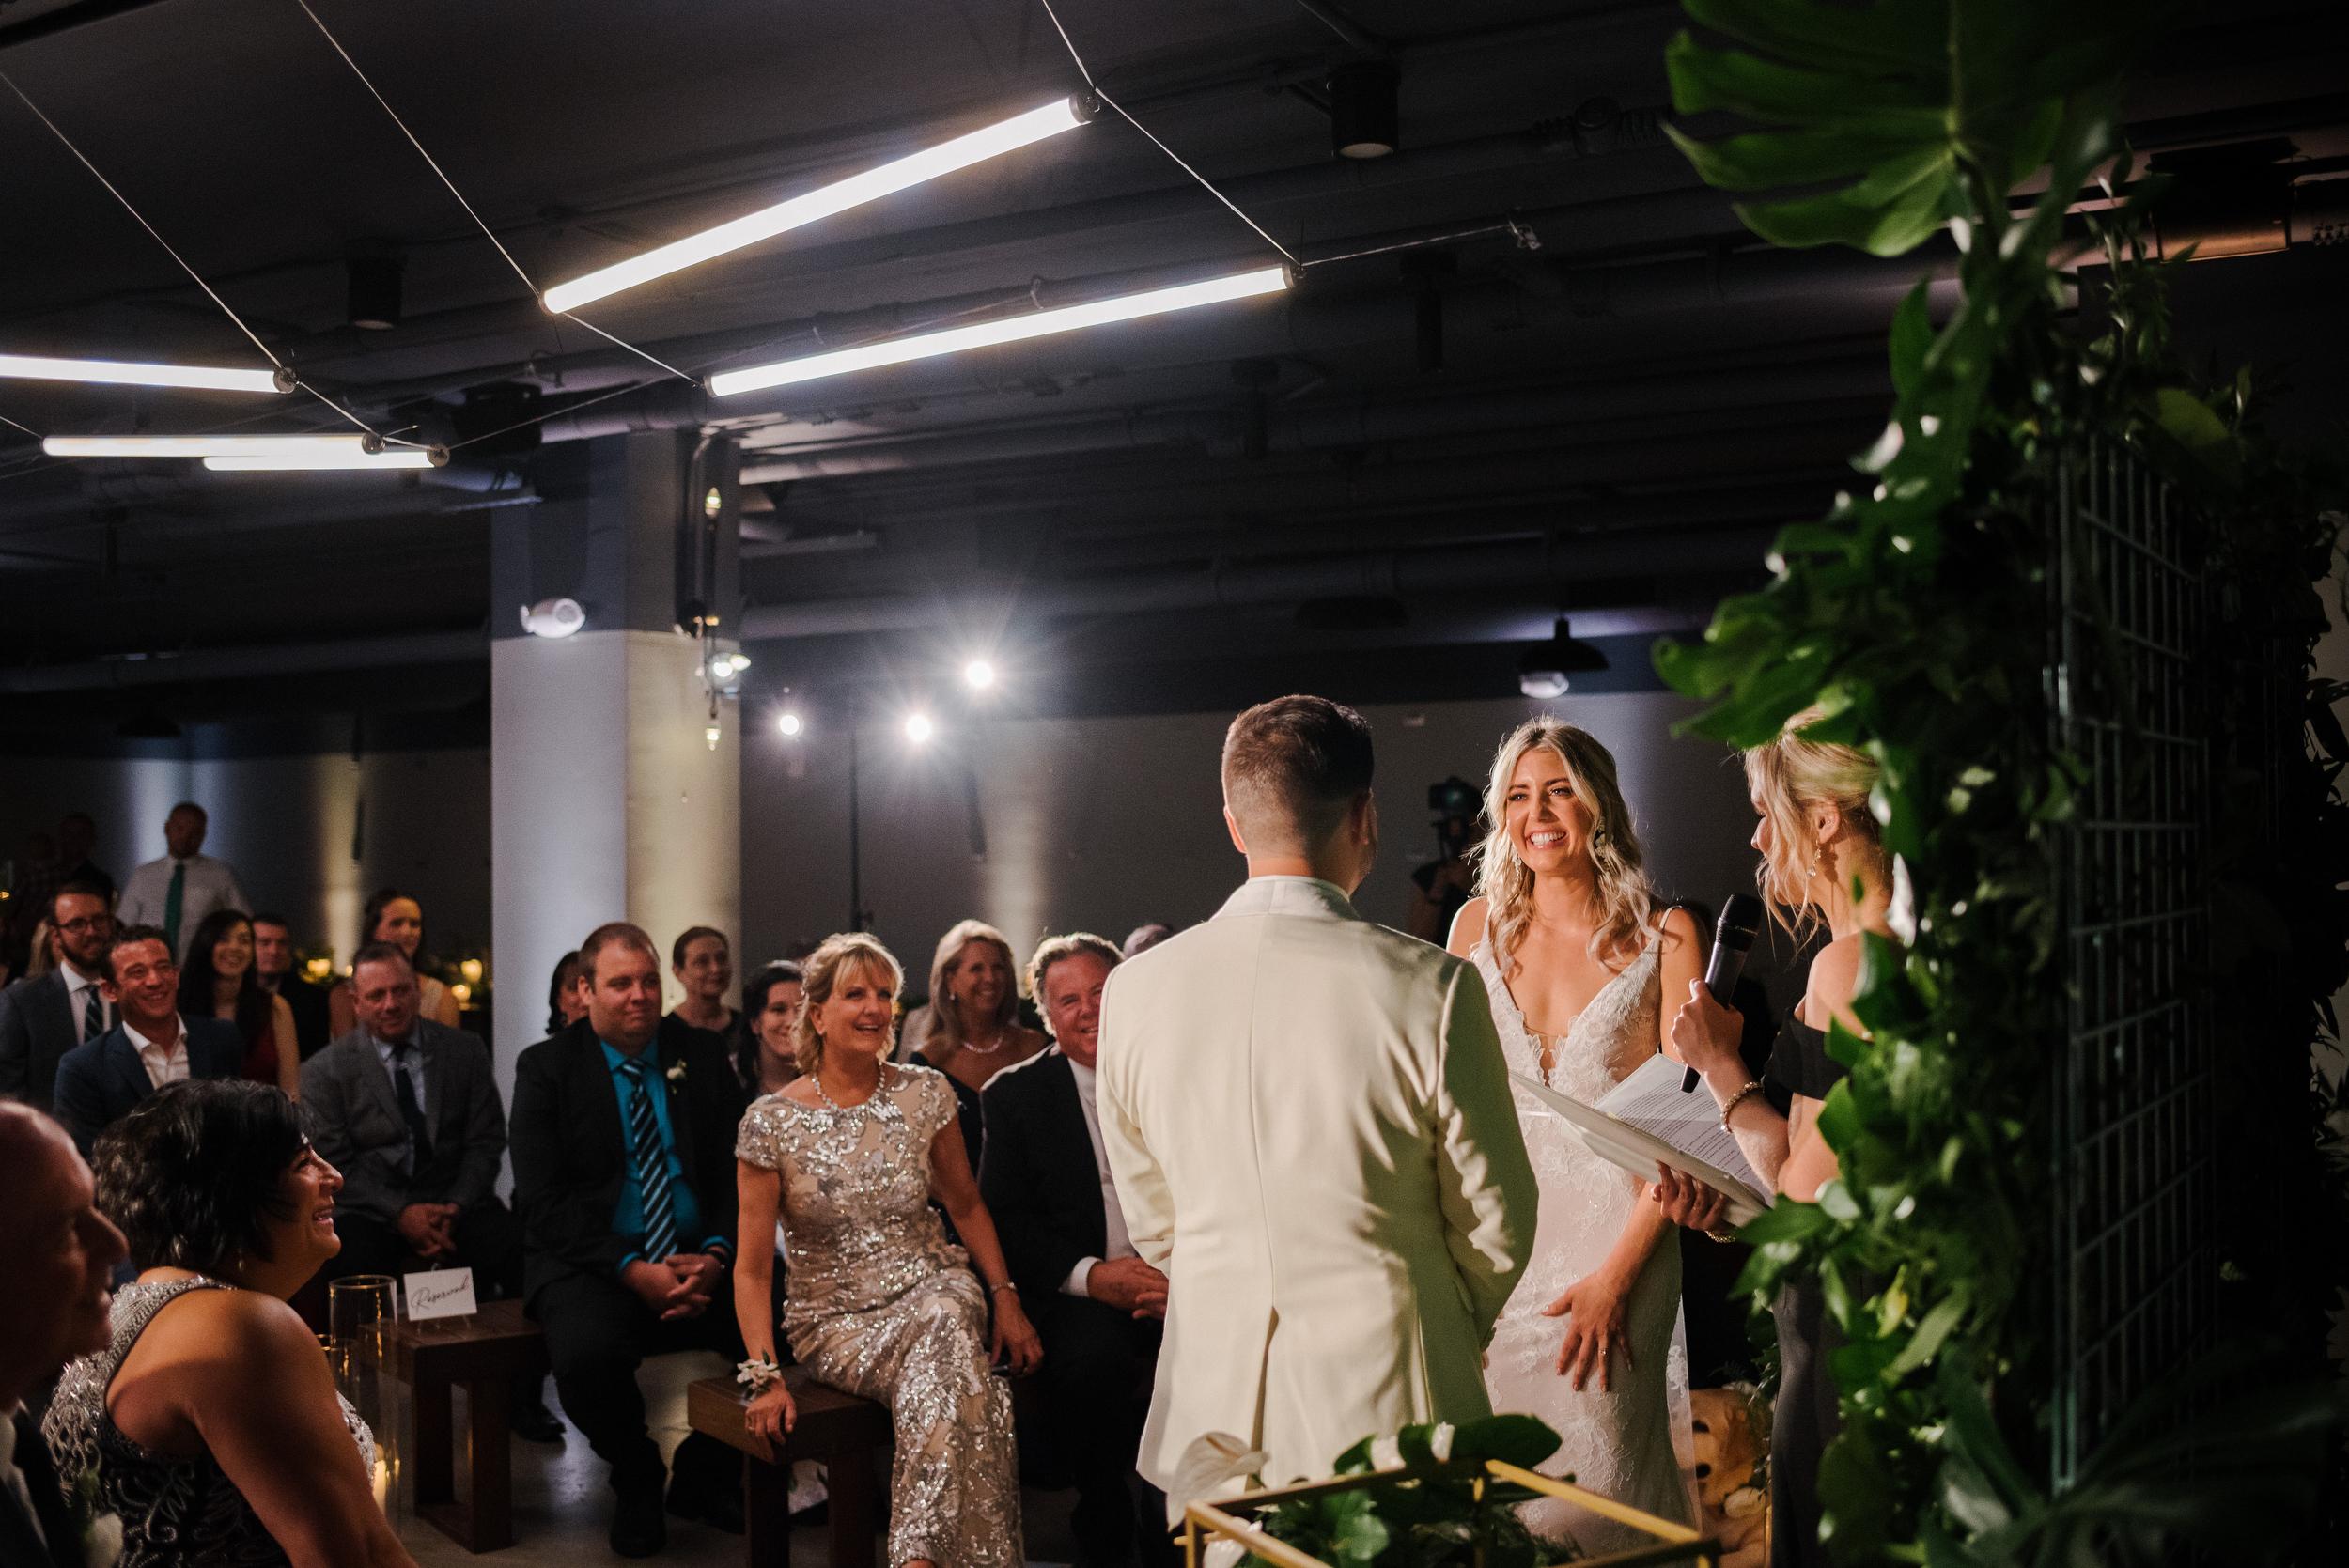 the_hotel_salem_wedding_mikhail_glabets_35.JPG